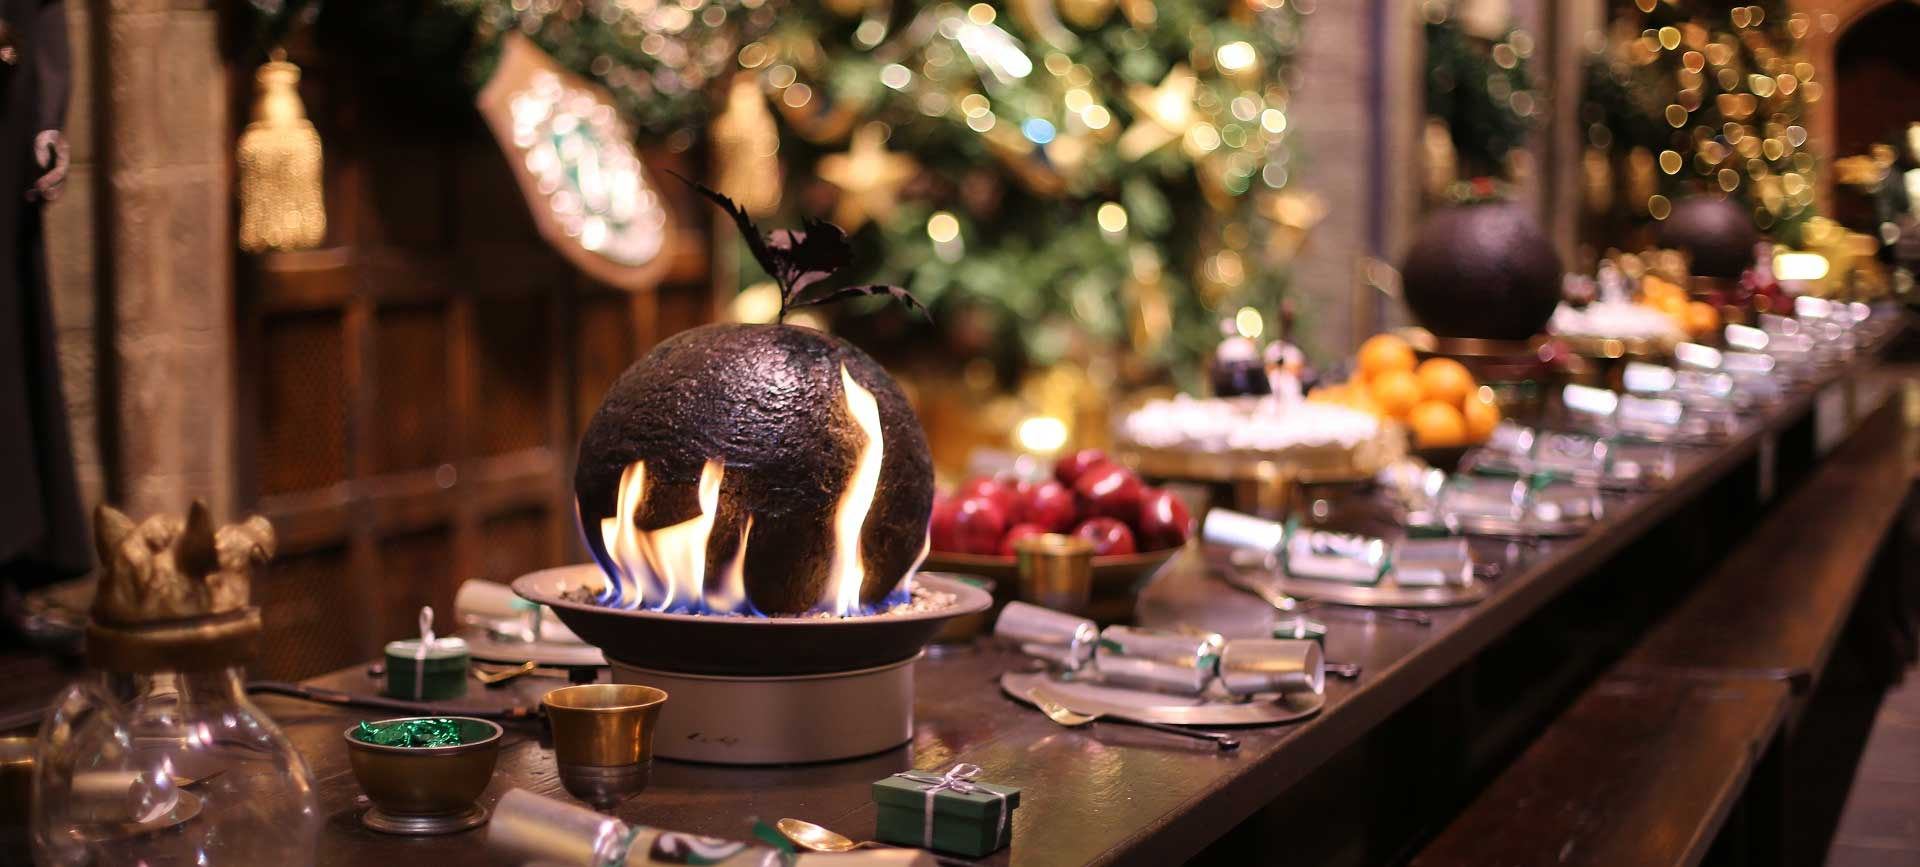 Hogwarts At Christmas 2021 Hogwarts In The Snow Warner Bros Studio Tour London